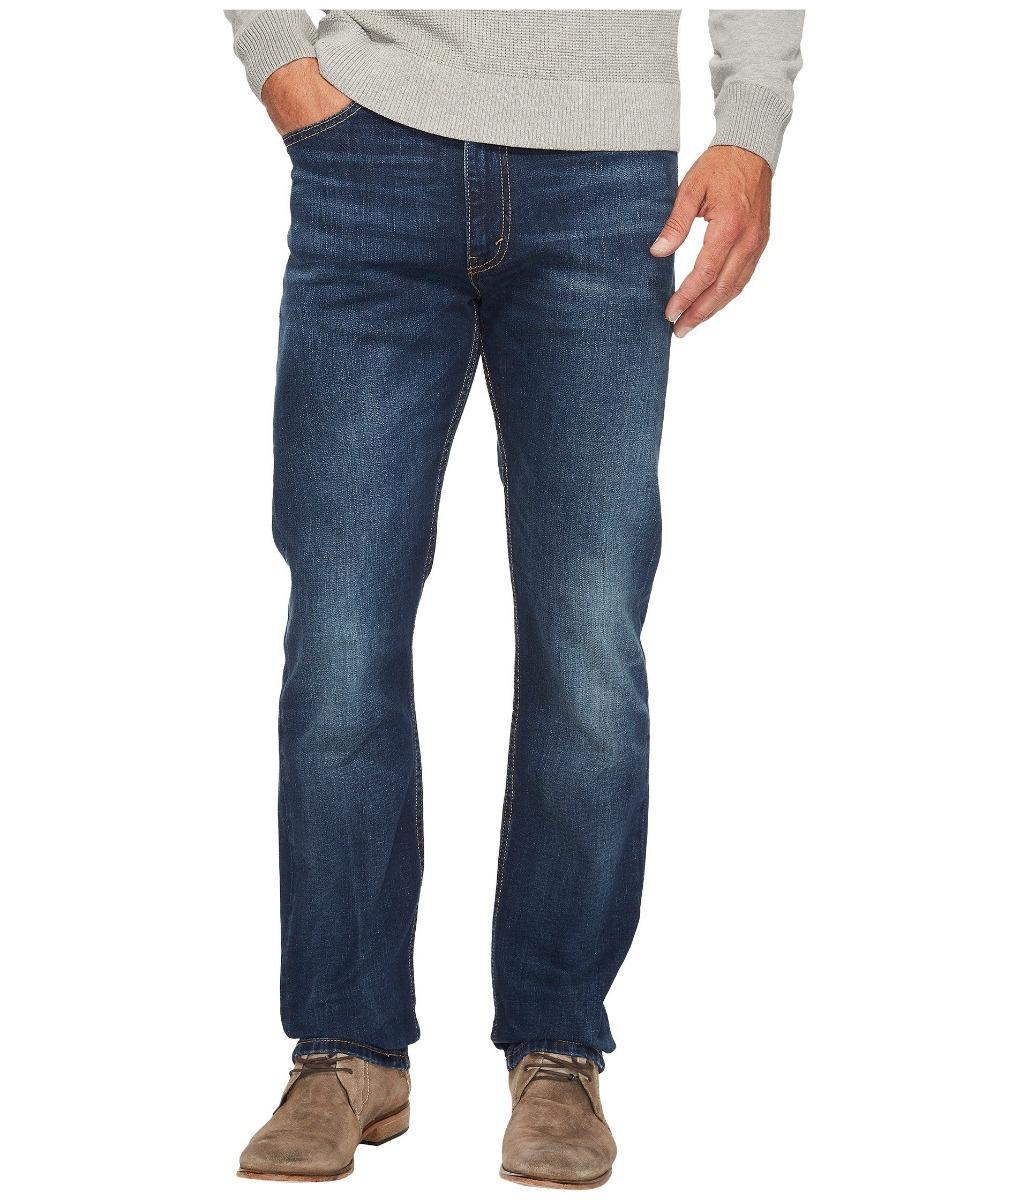 Straight Fit 513 Levi's® Slim Mens Pantalón LUVGpjqSzM